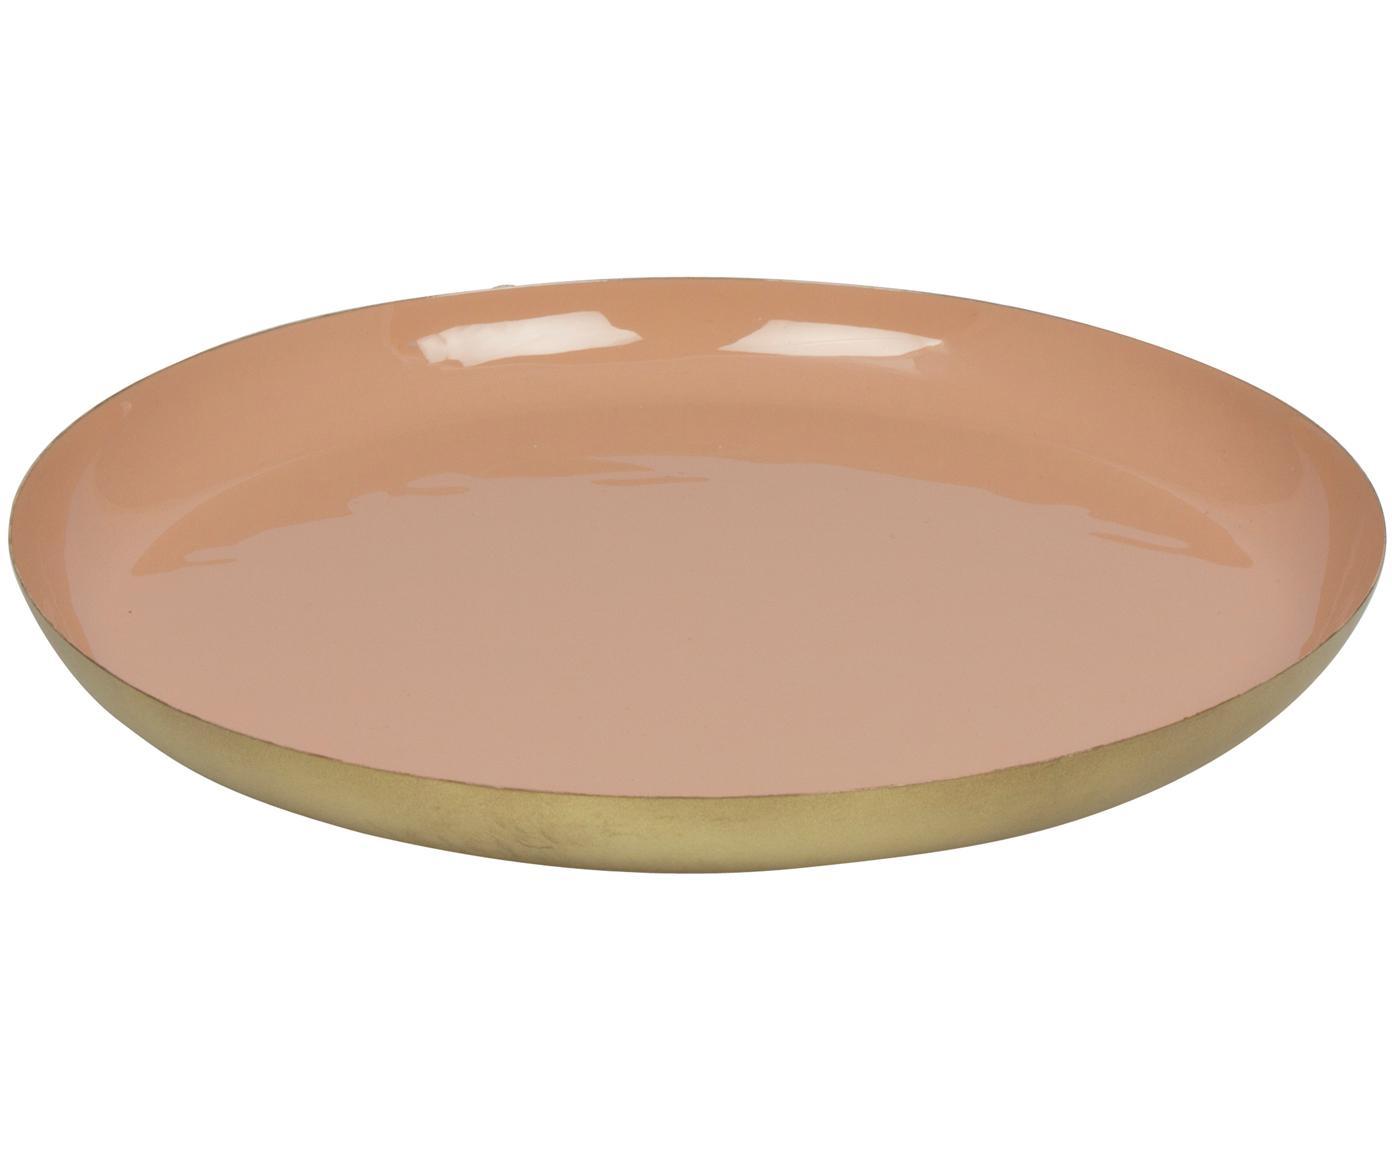 Bandeja decorativa Julienne, Metal, recubierto, Rosa, dorado, Ø 29 x Al 3 cm